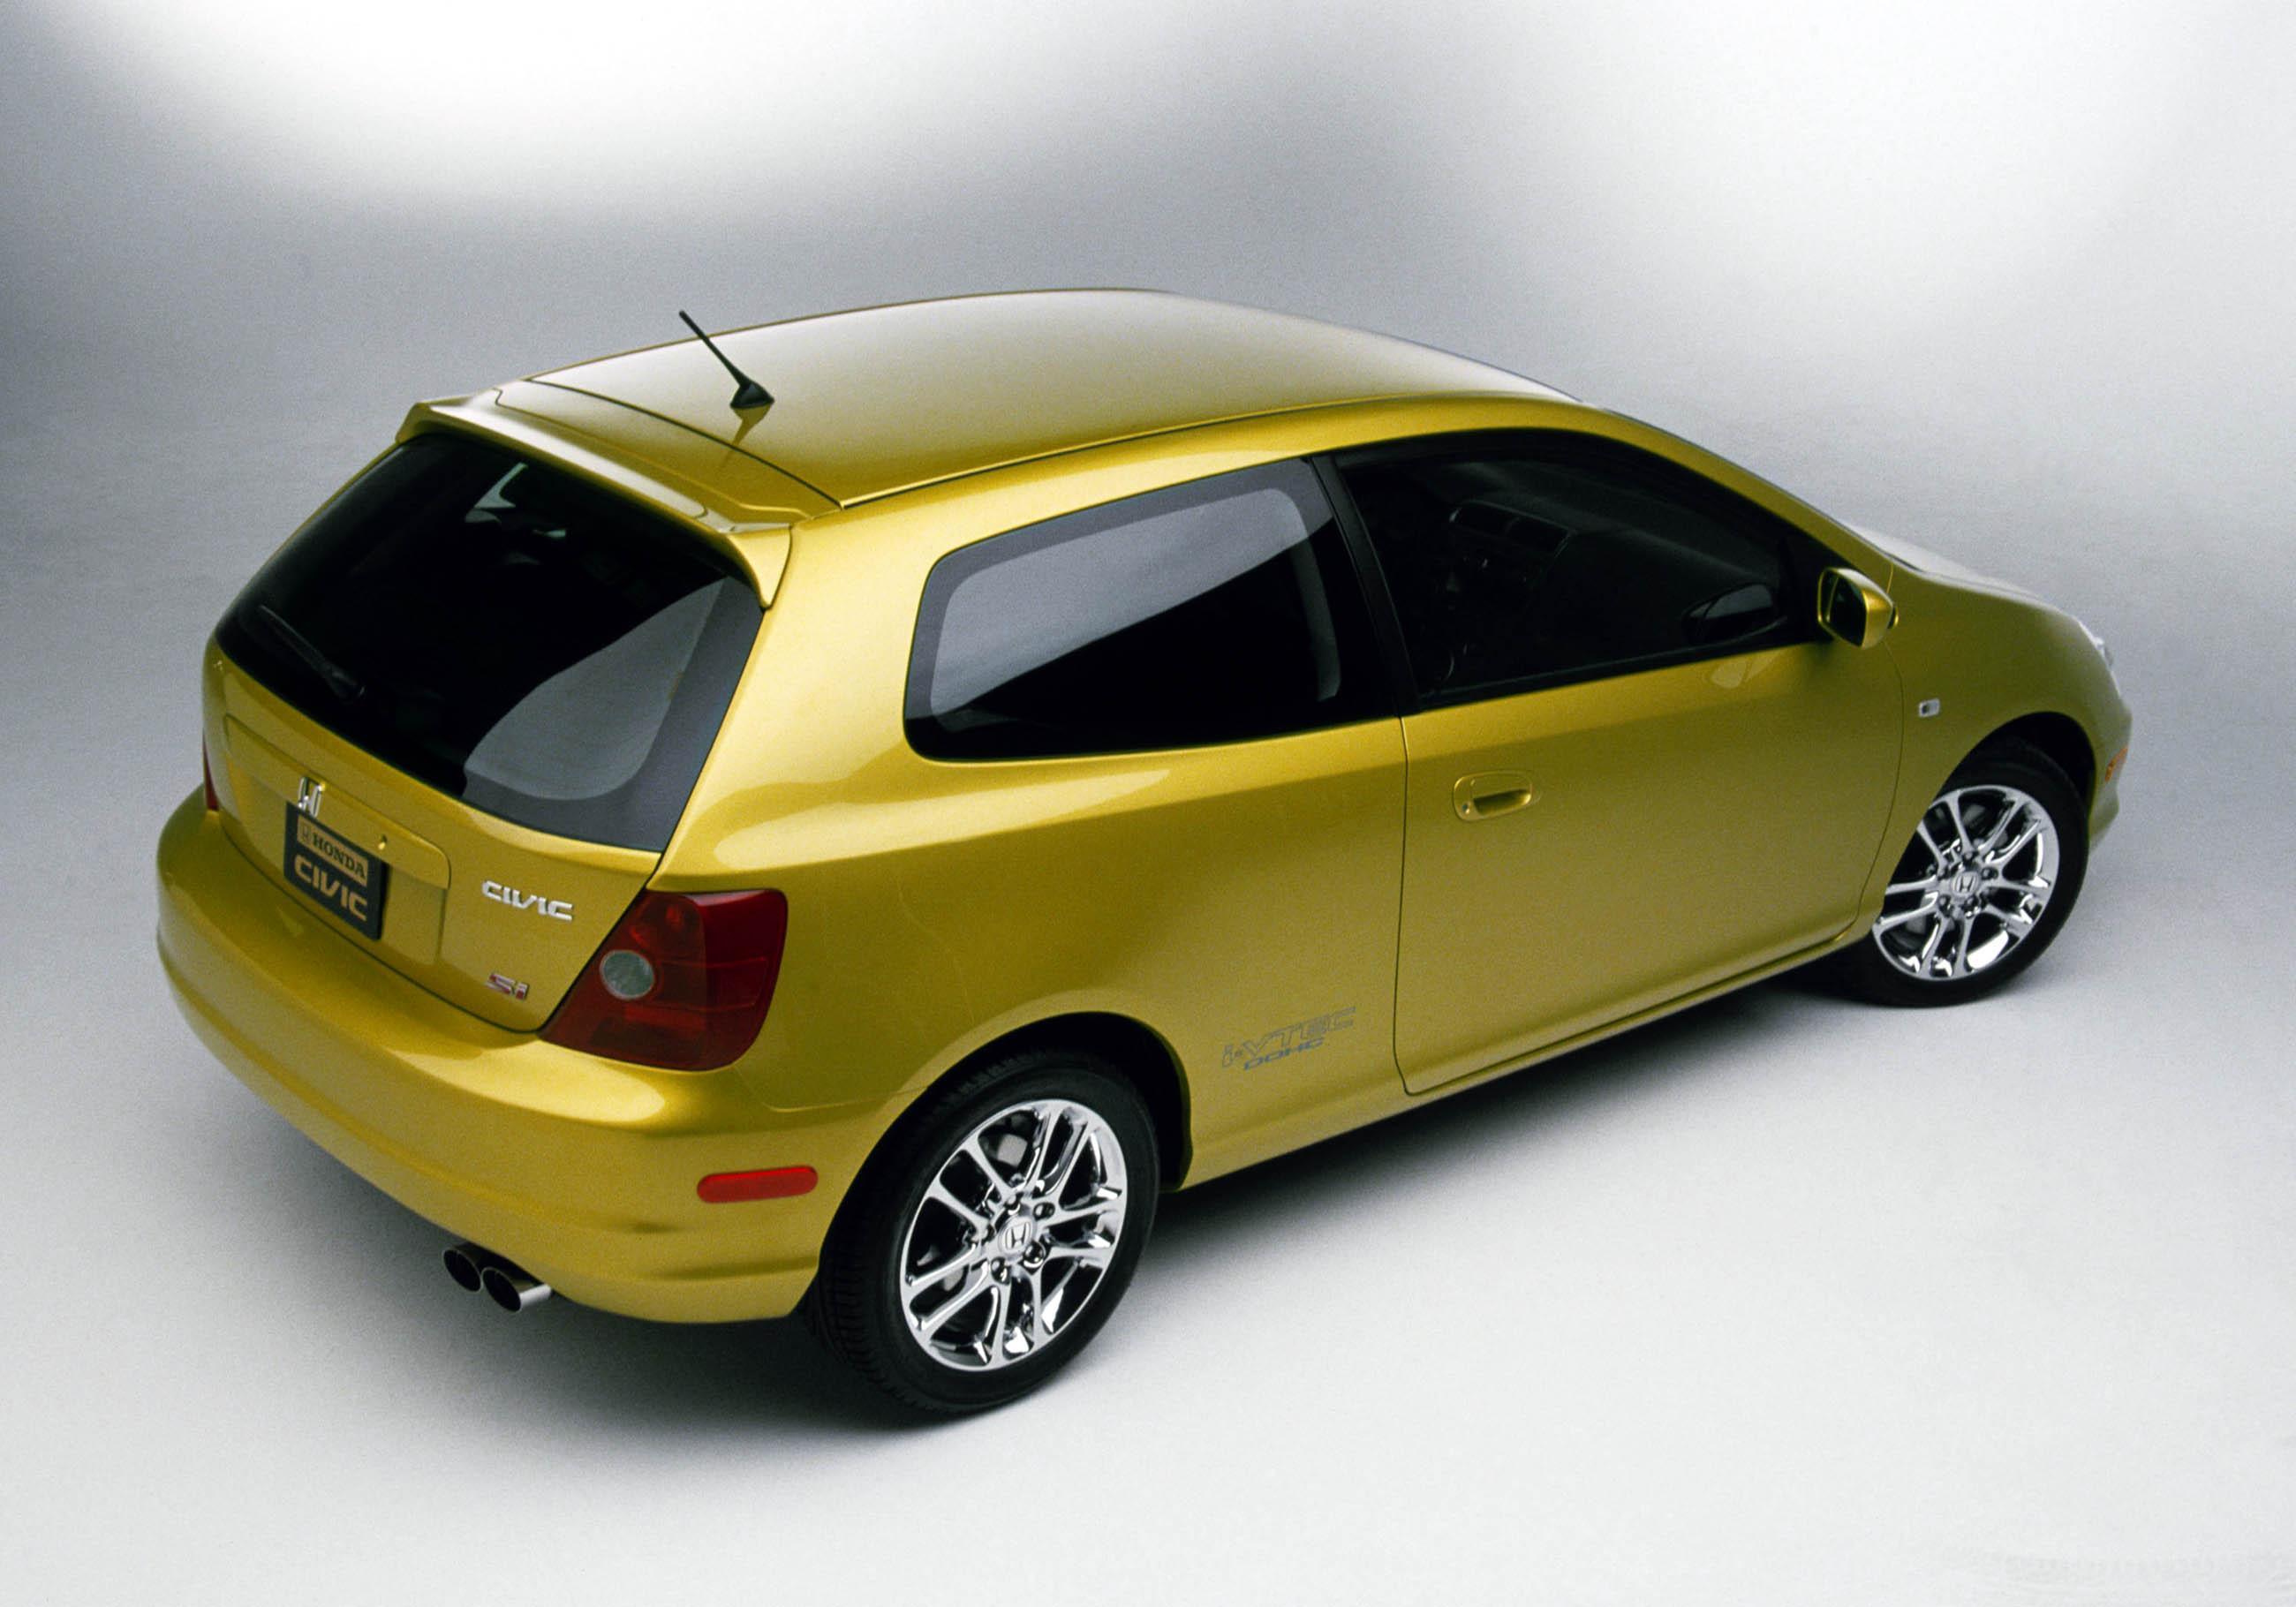 2001 Honda Civic Si Concept - HD Pictures @ carsinvasion.com